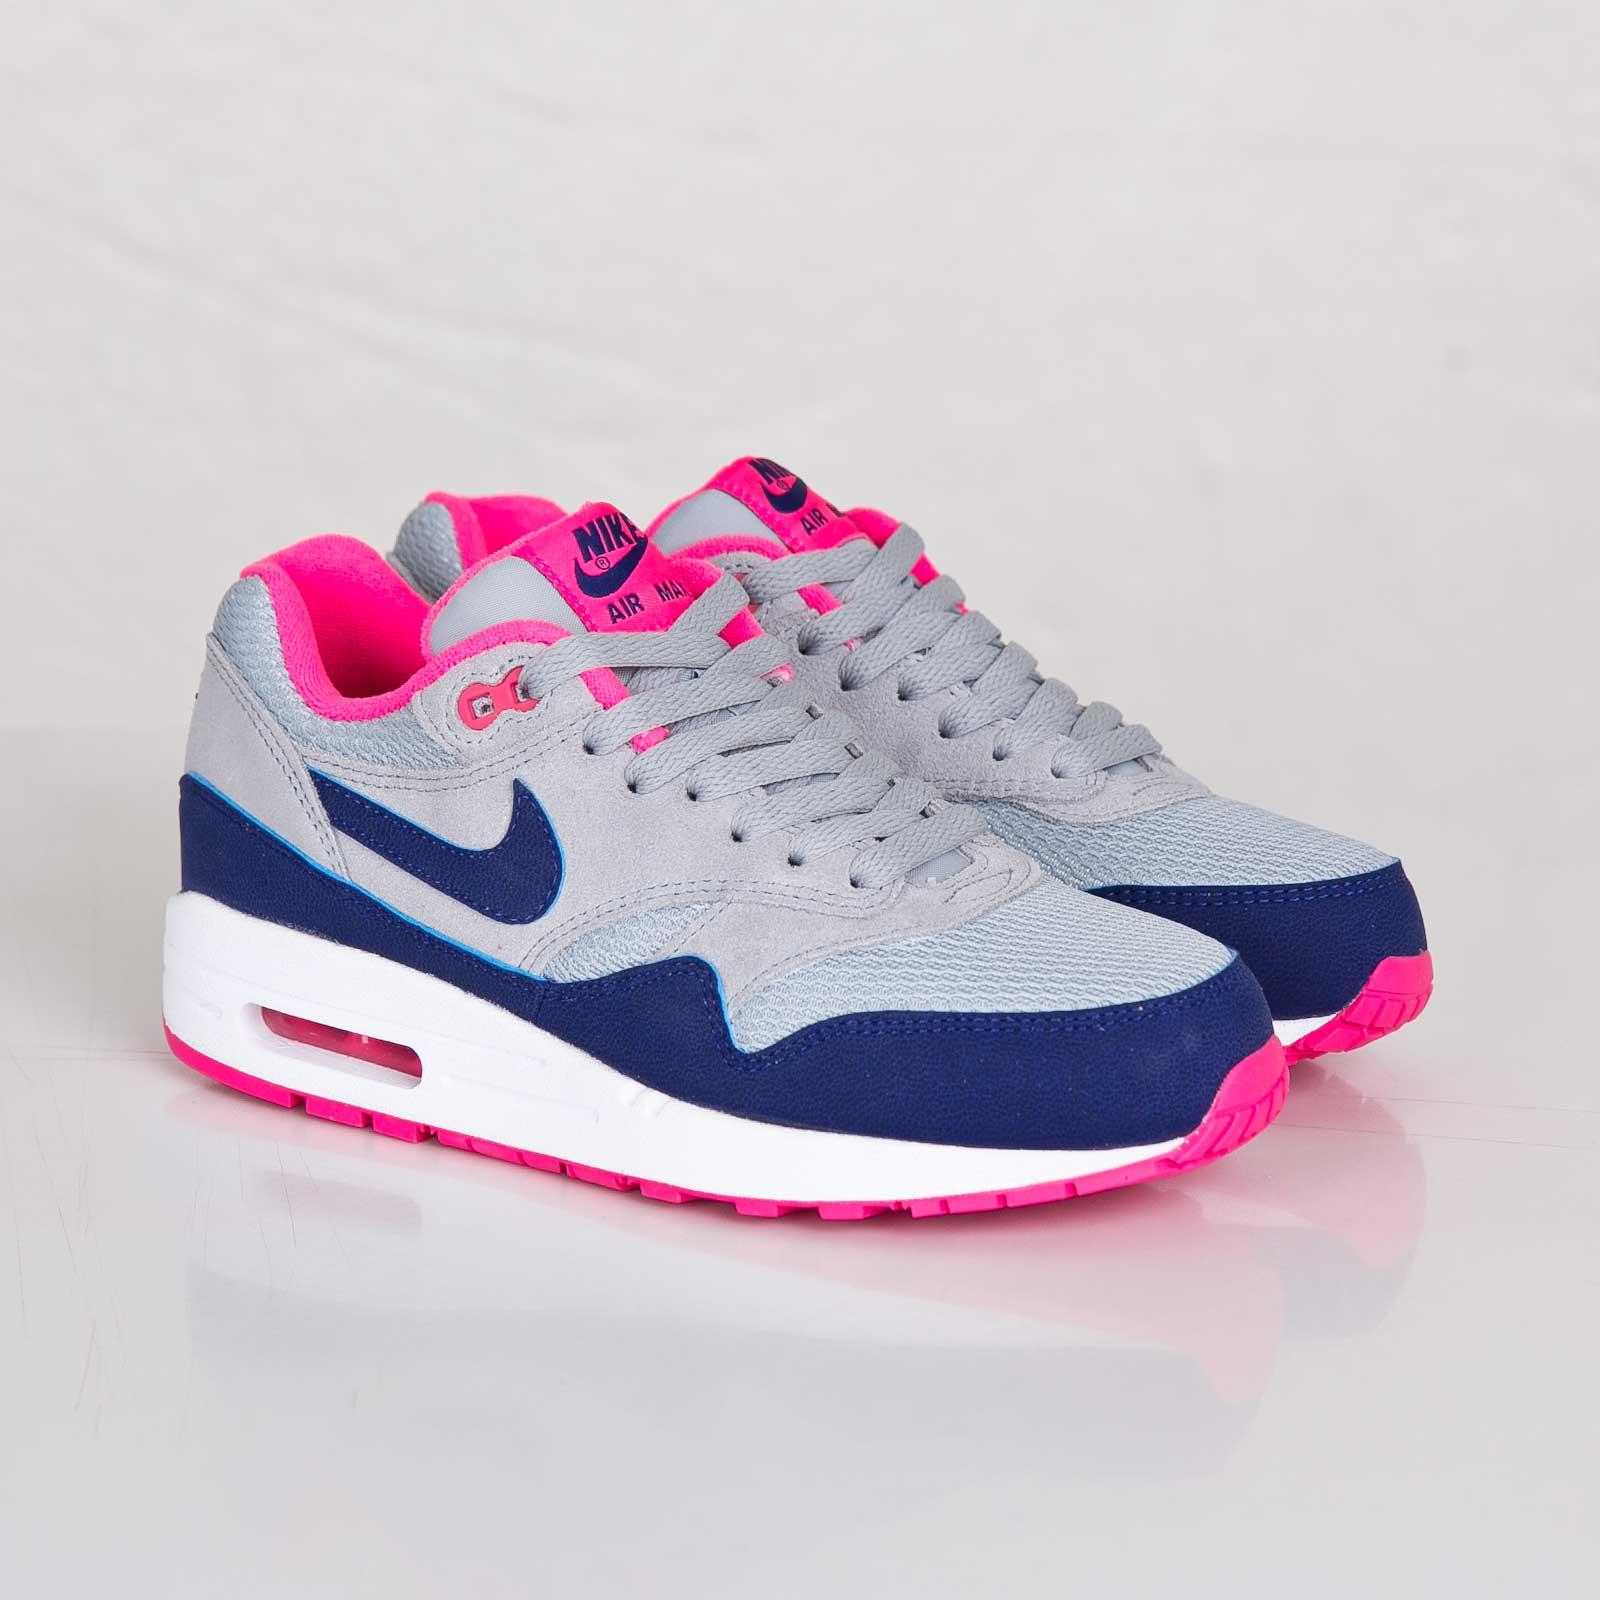 1 599820 Max 003 Wmns Sneakersnstuff Essential Air Nike 4tgvq4